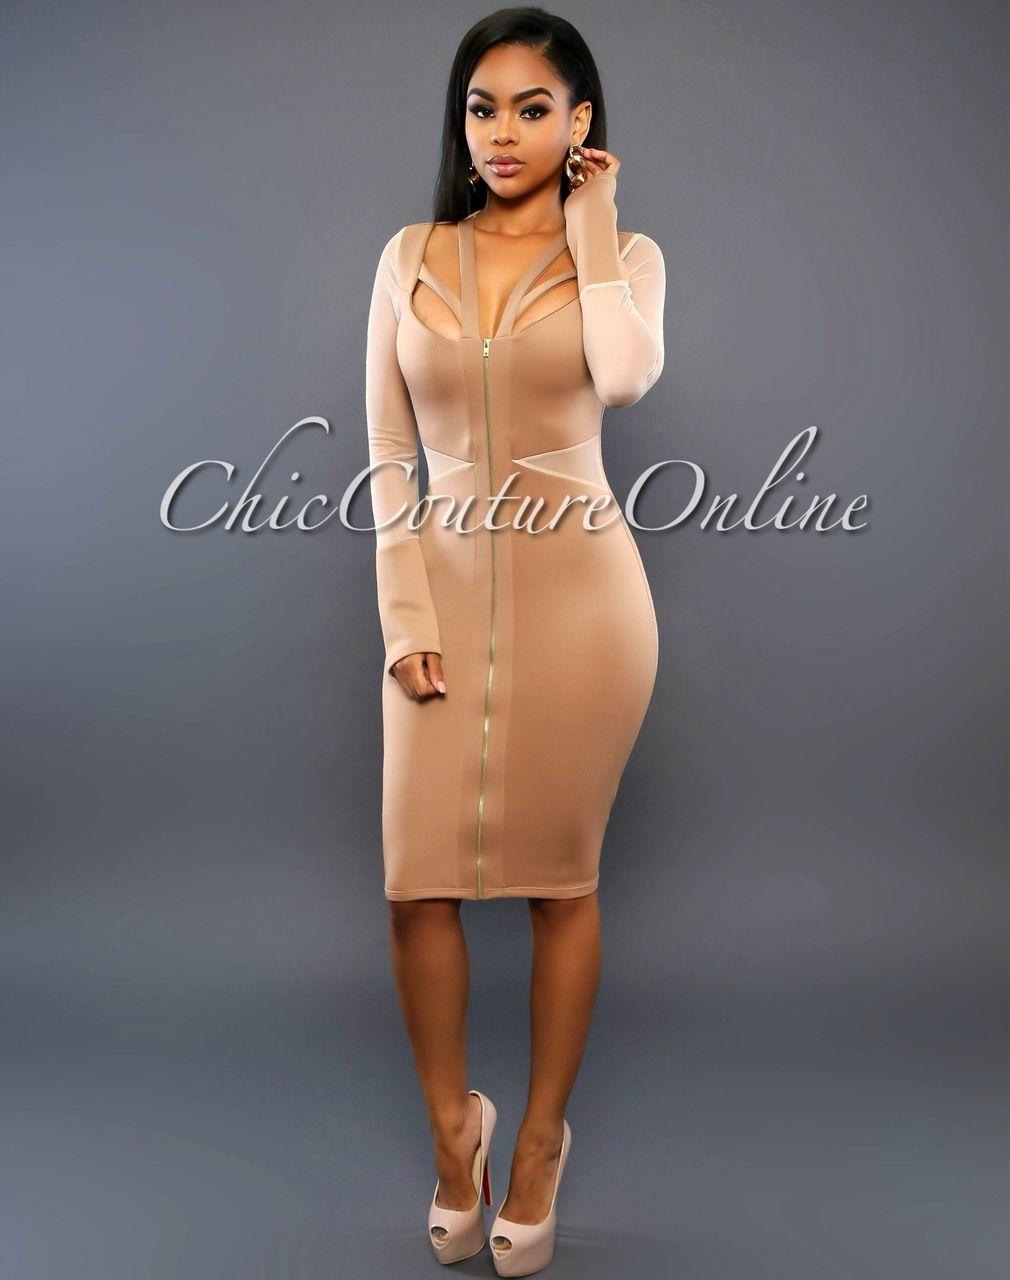 Pin von Chic Couture Online auf Clothing ~ Chic Couture Online ...